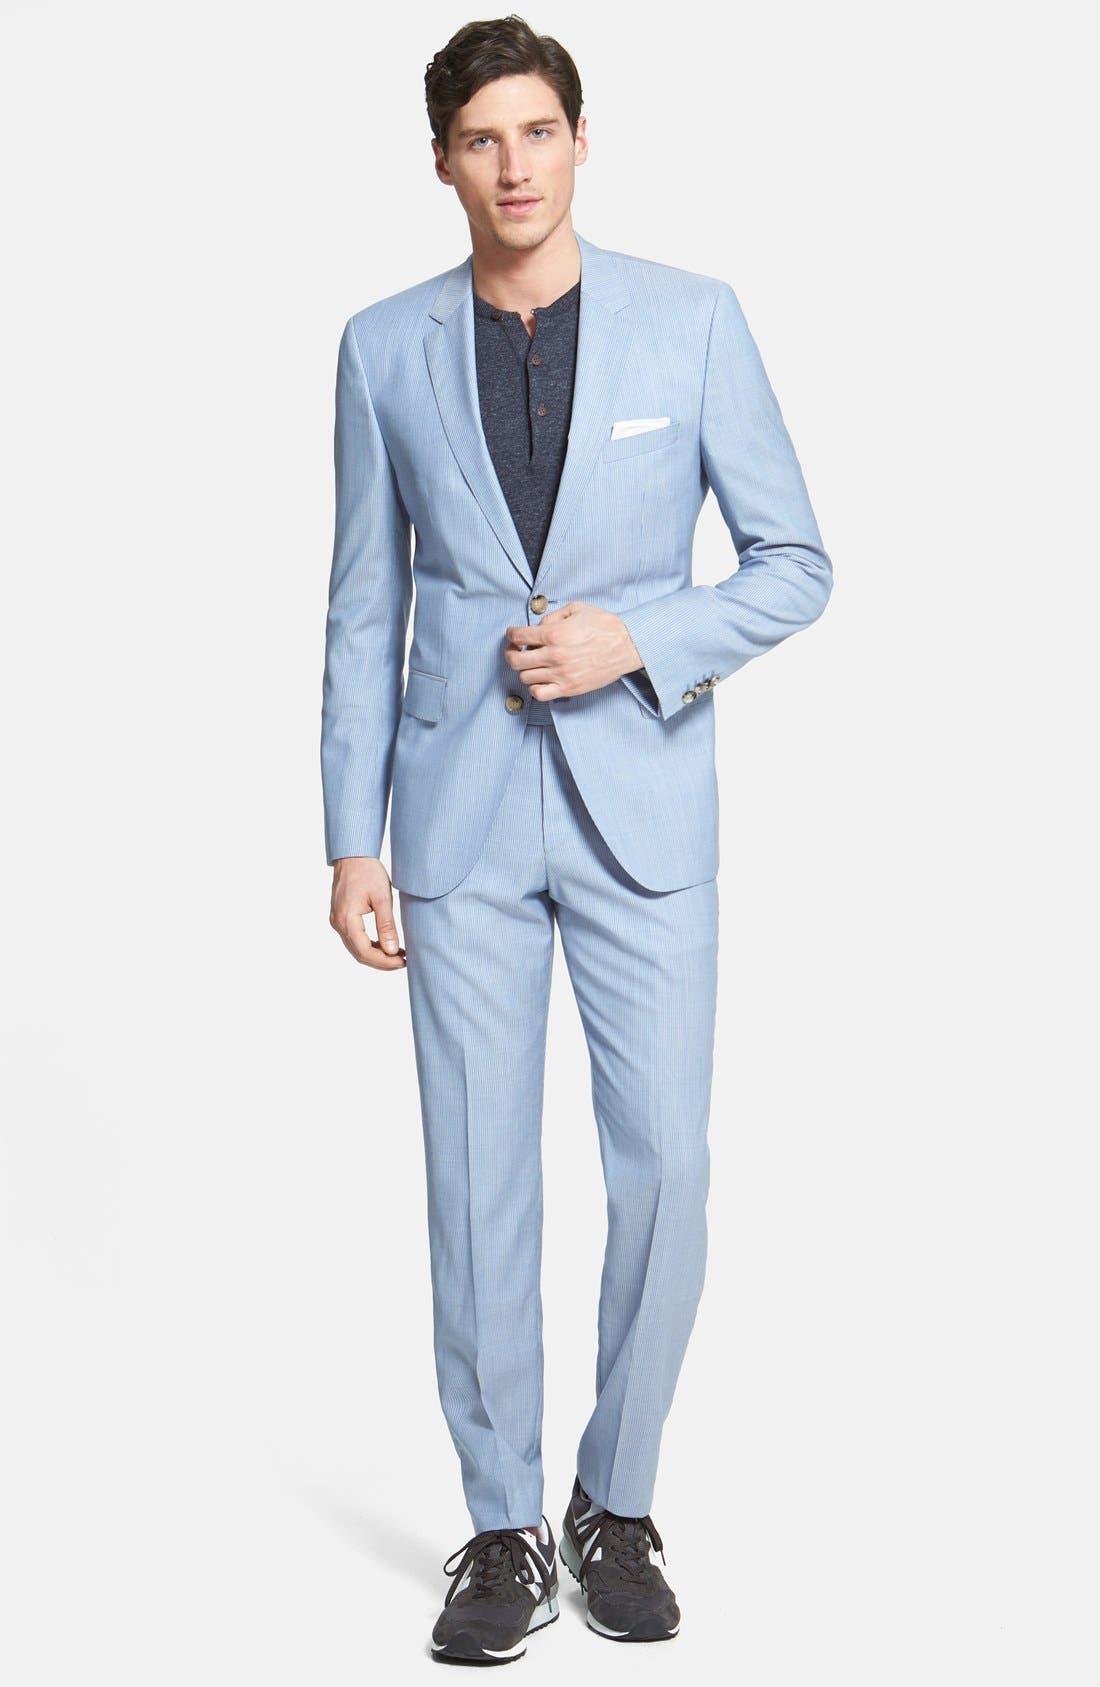 Alternate Image 1 Selected - BOSS HUGO BOSS 'James/Sharp' Trim Fit Virgin Wool Suit